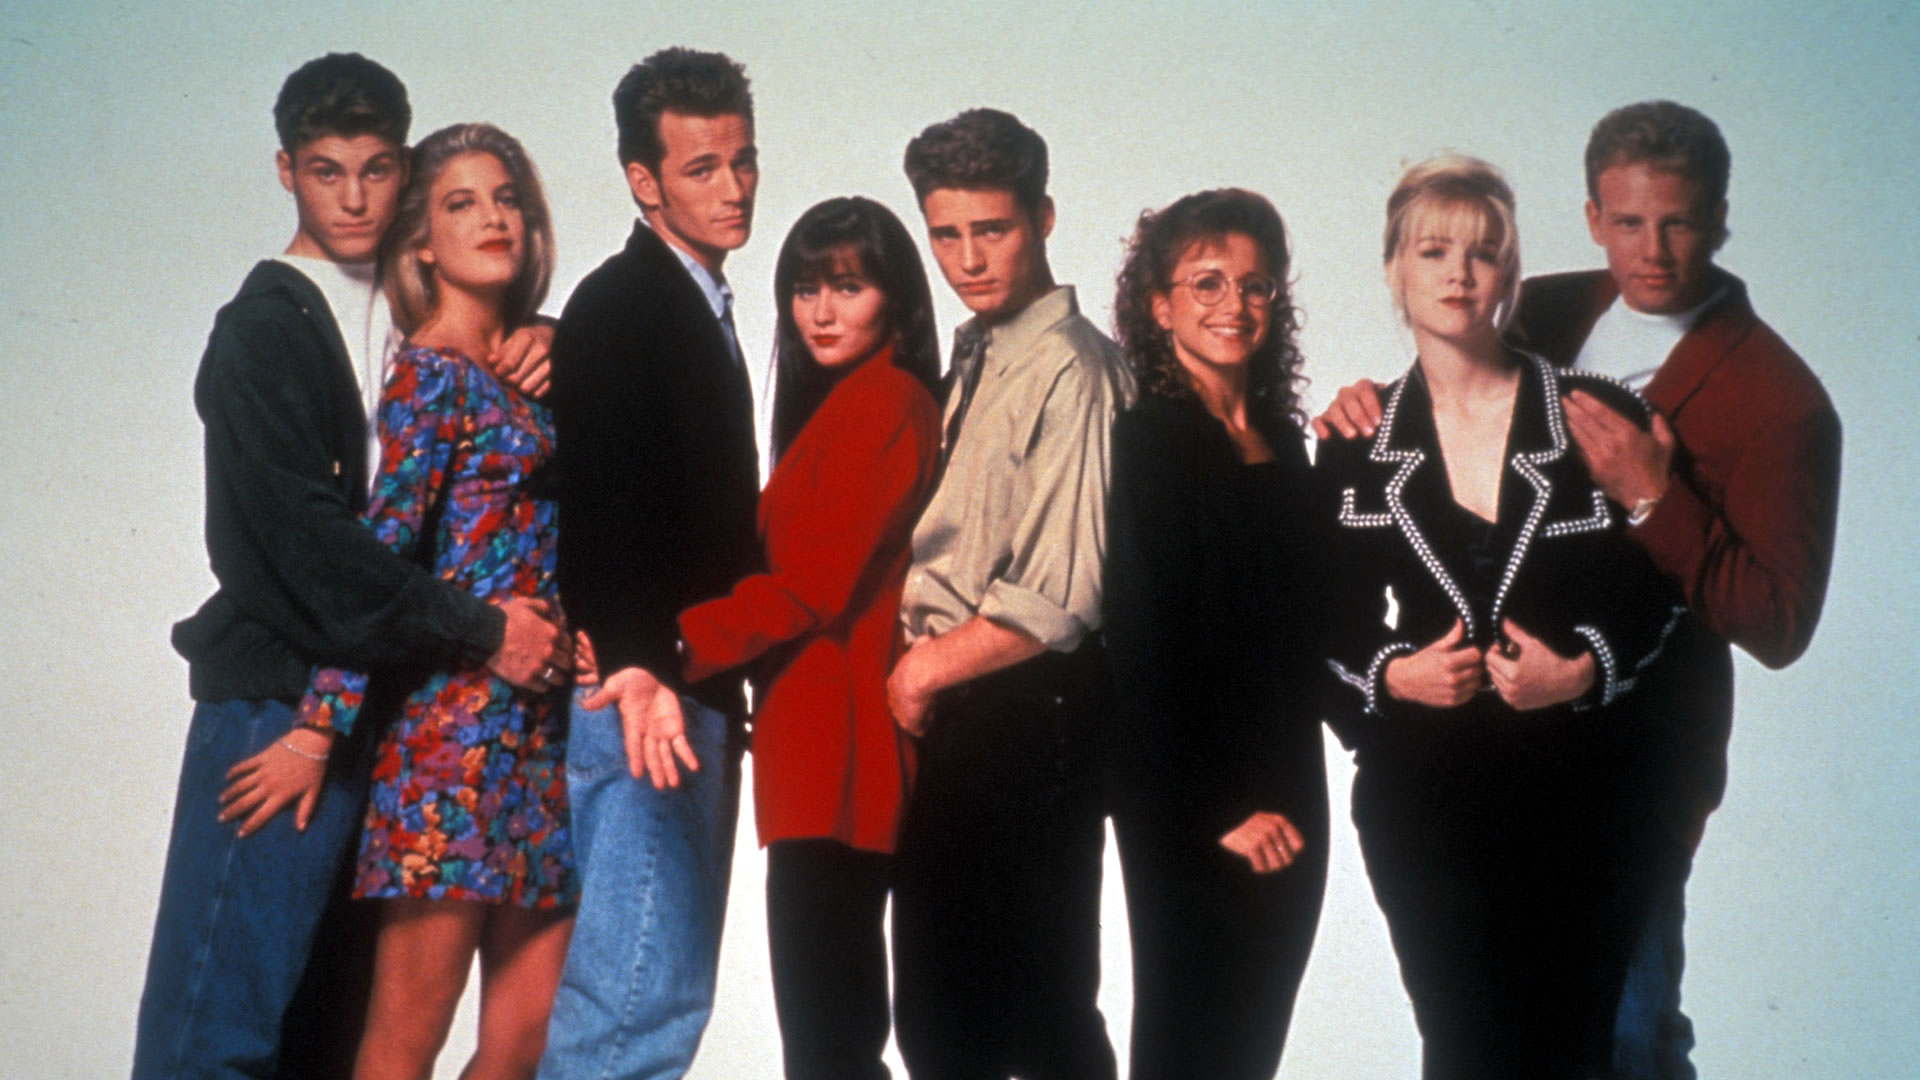 90210 DVD Release: Music Dissociation